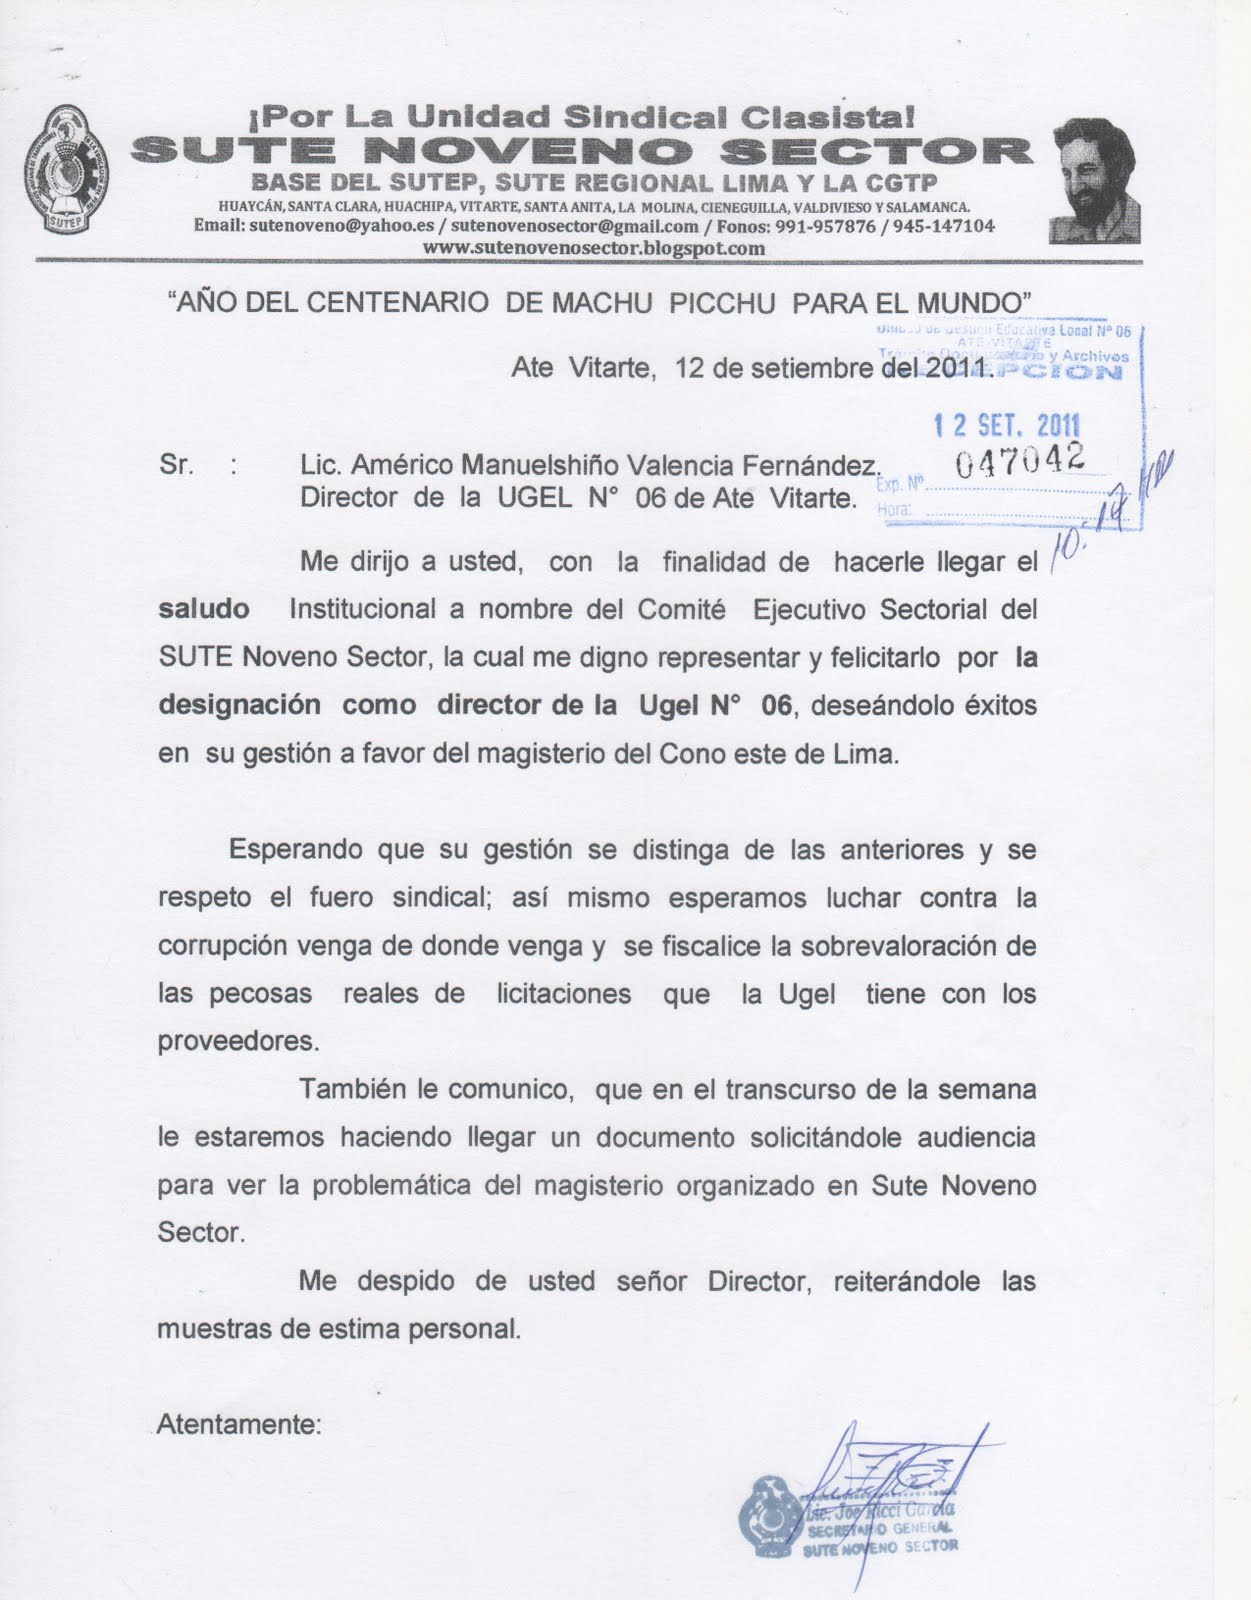 NUEVO DIRECTOR DE LA UGEL N° 06 DE ATE VITARTE.